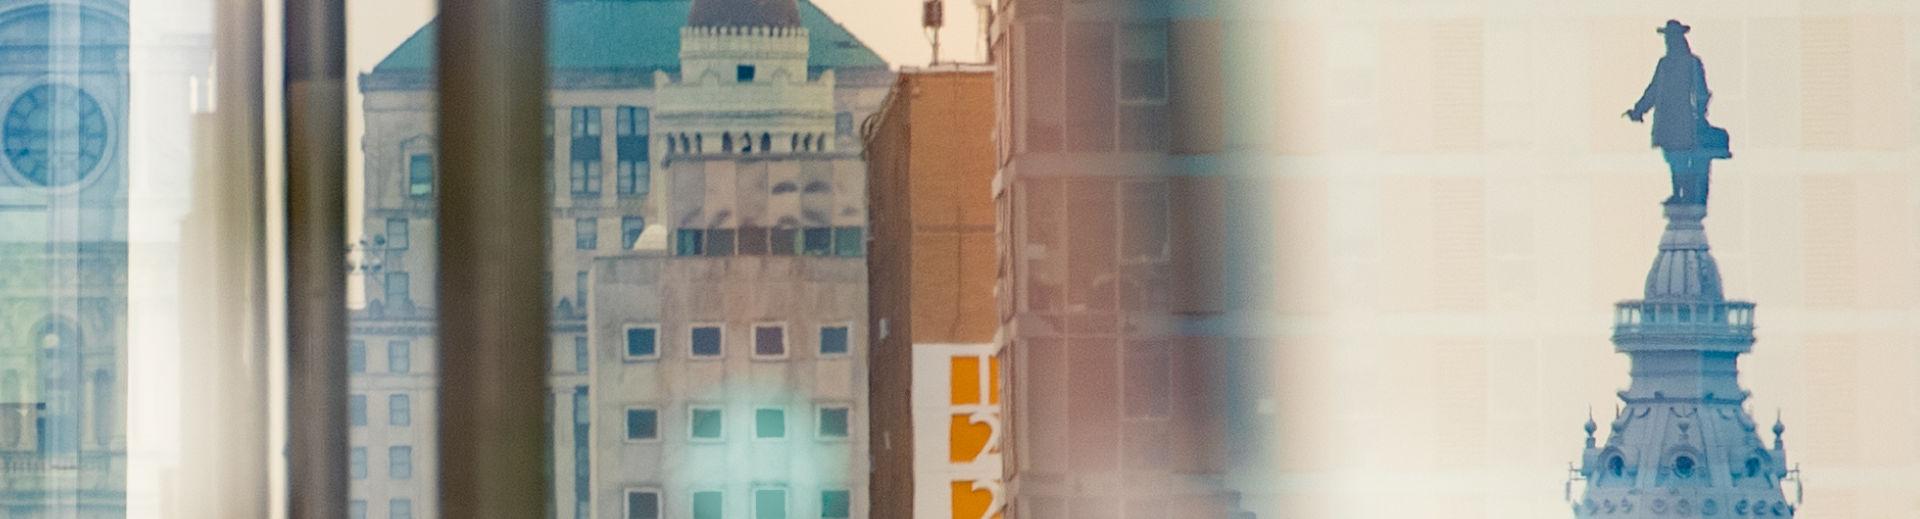 An abstract, layered image of the Philadelphia skyline